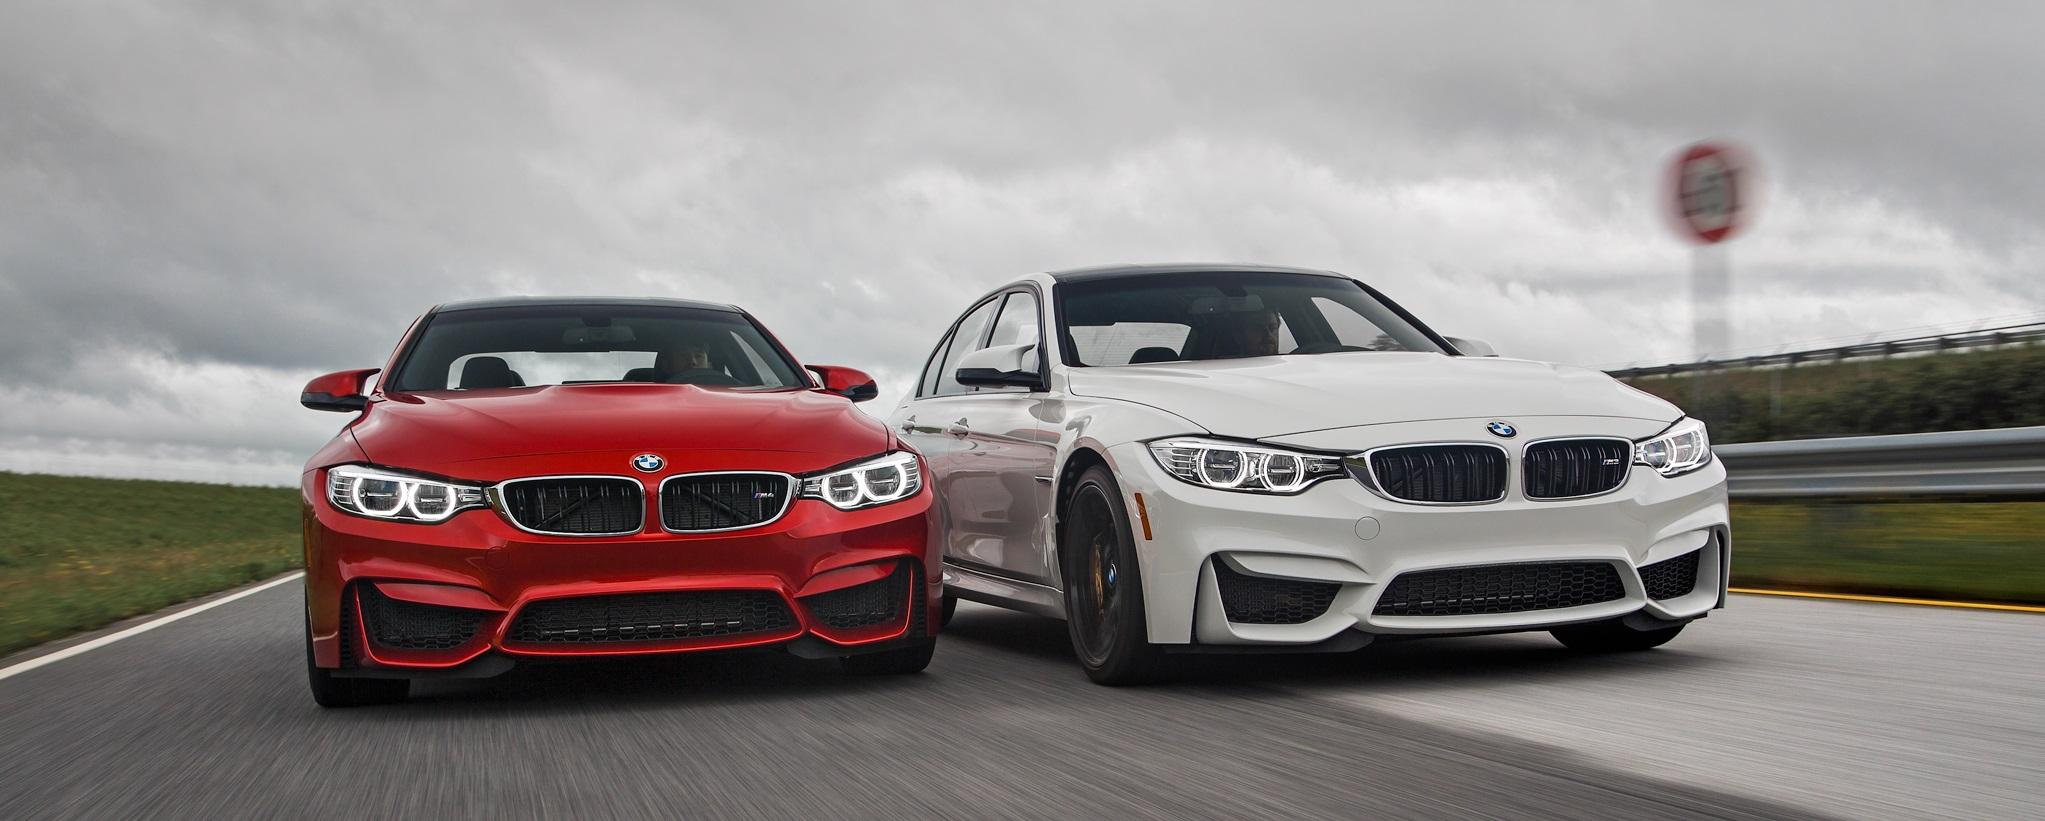 BMW-M5-race